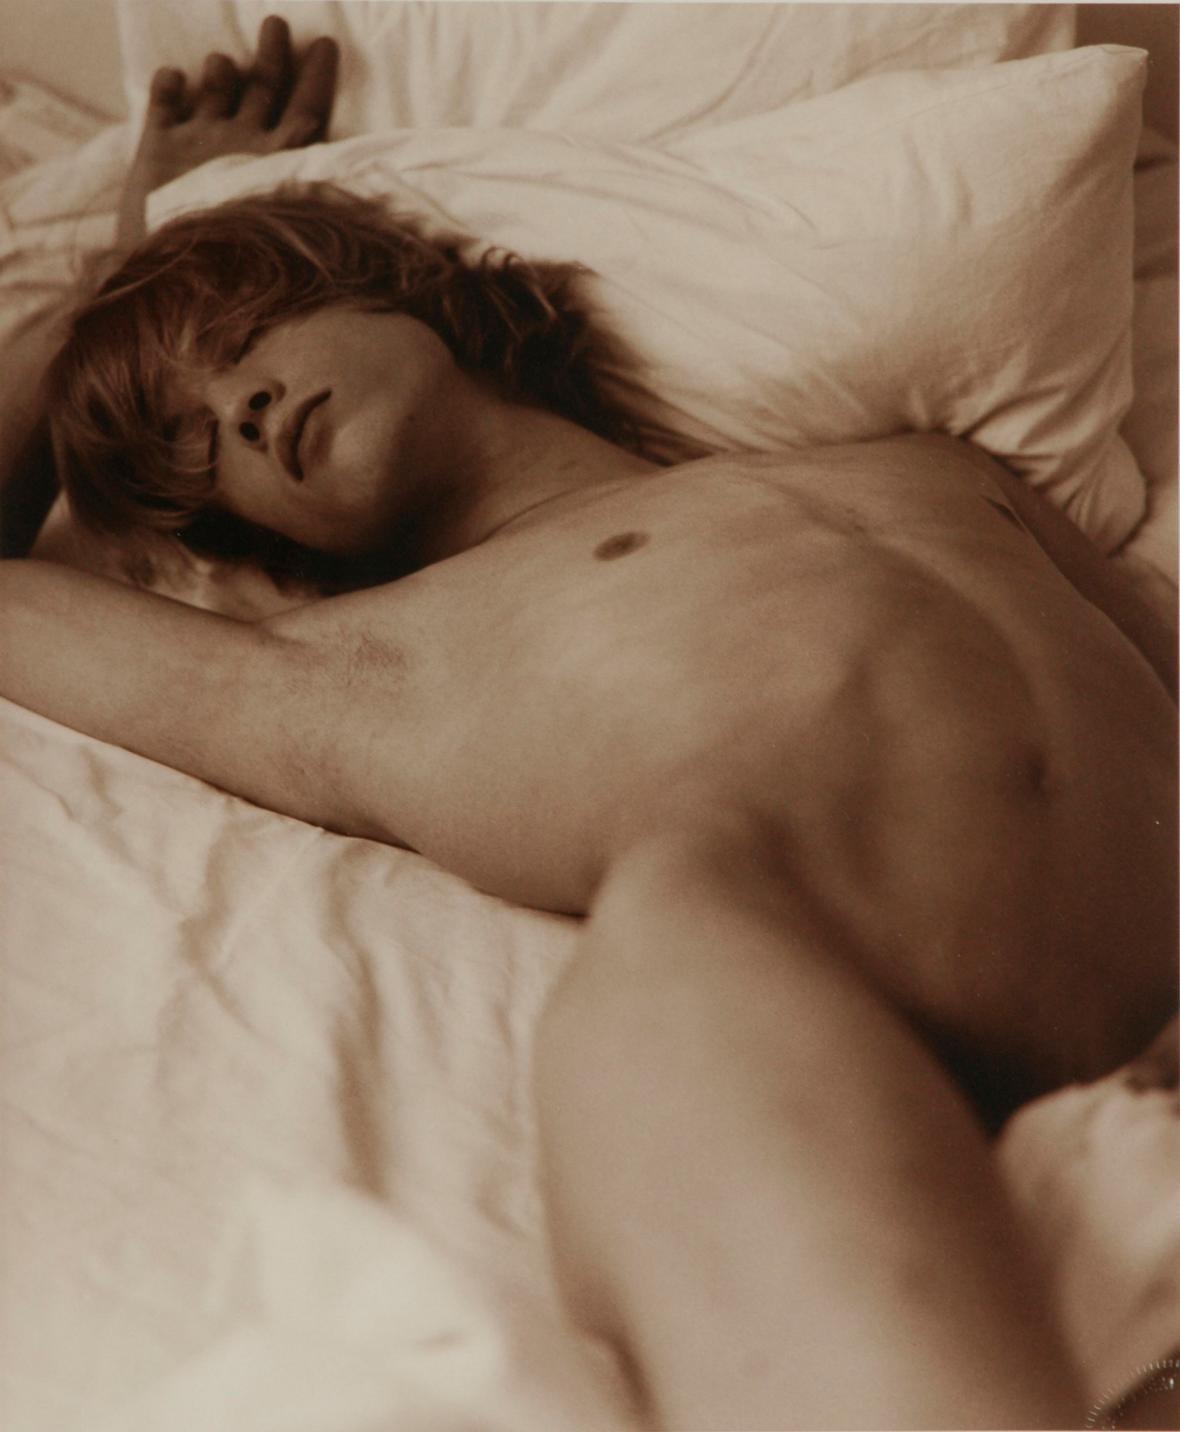 Robert Vano / S Jirkou v posteli, 2002